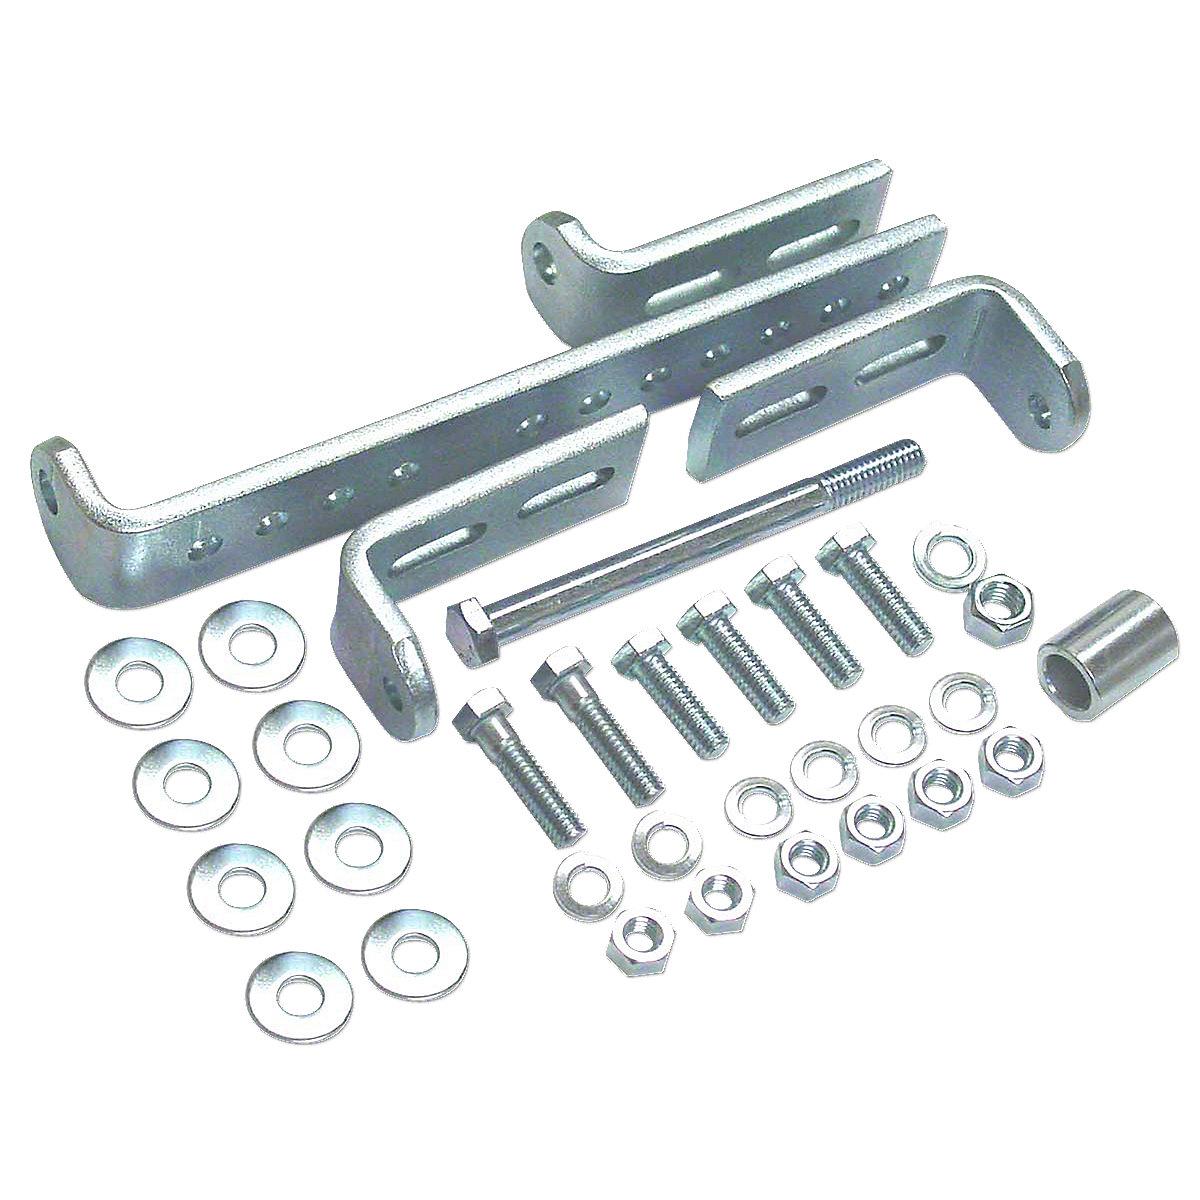 Abc404 universal alternator mounting kit for massey harris and